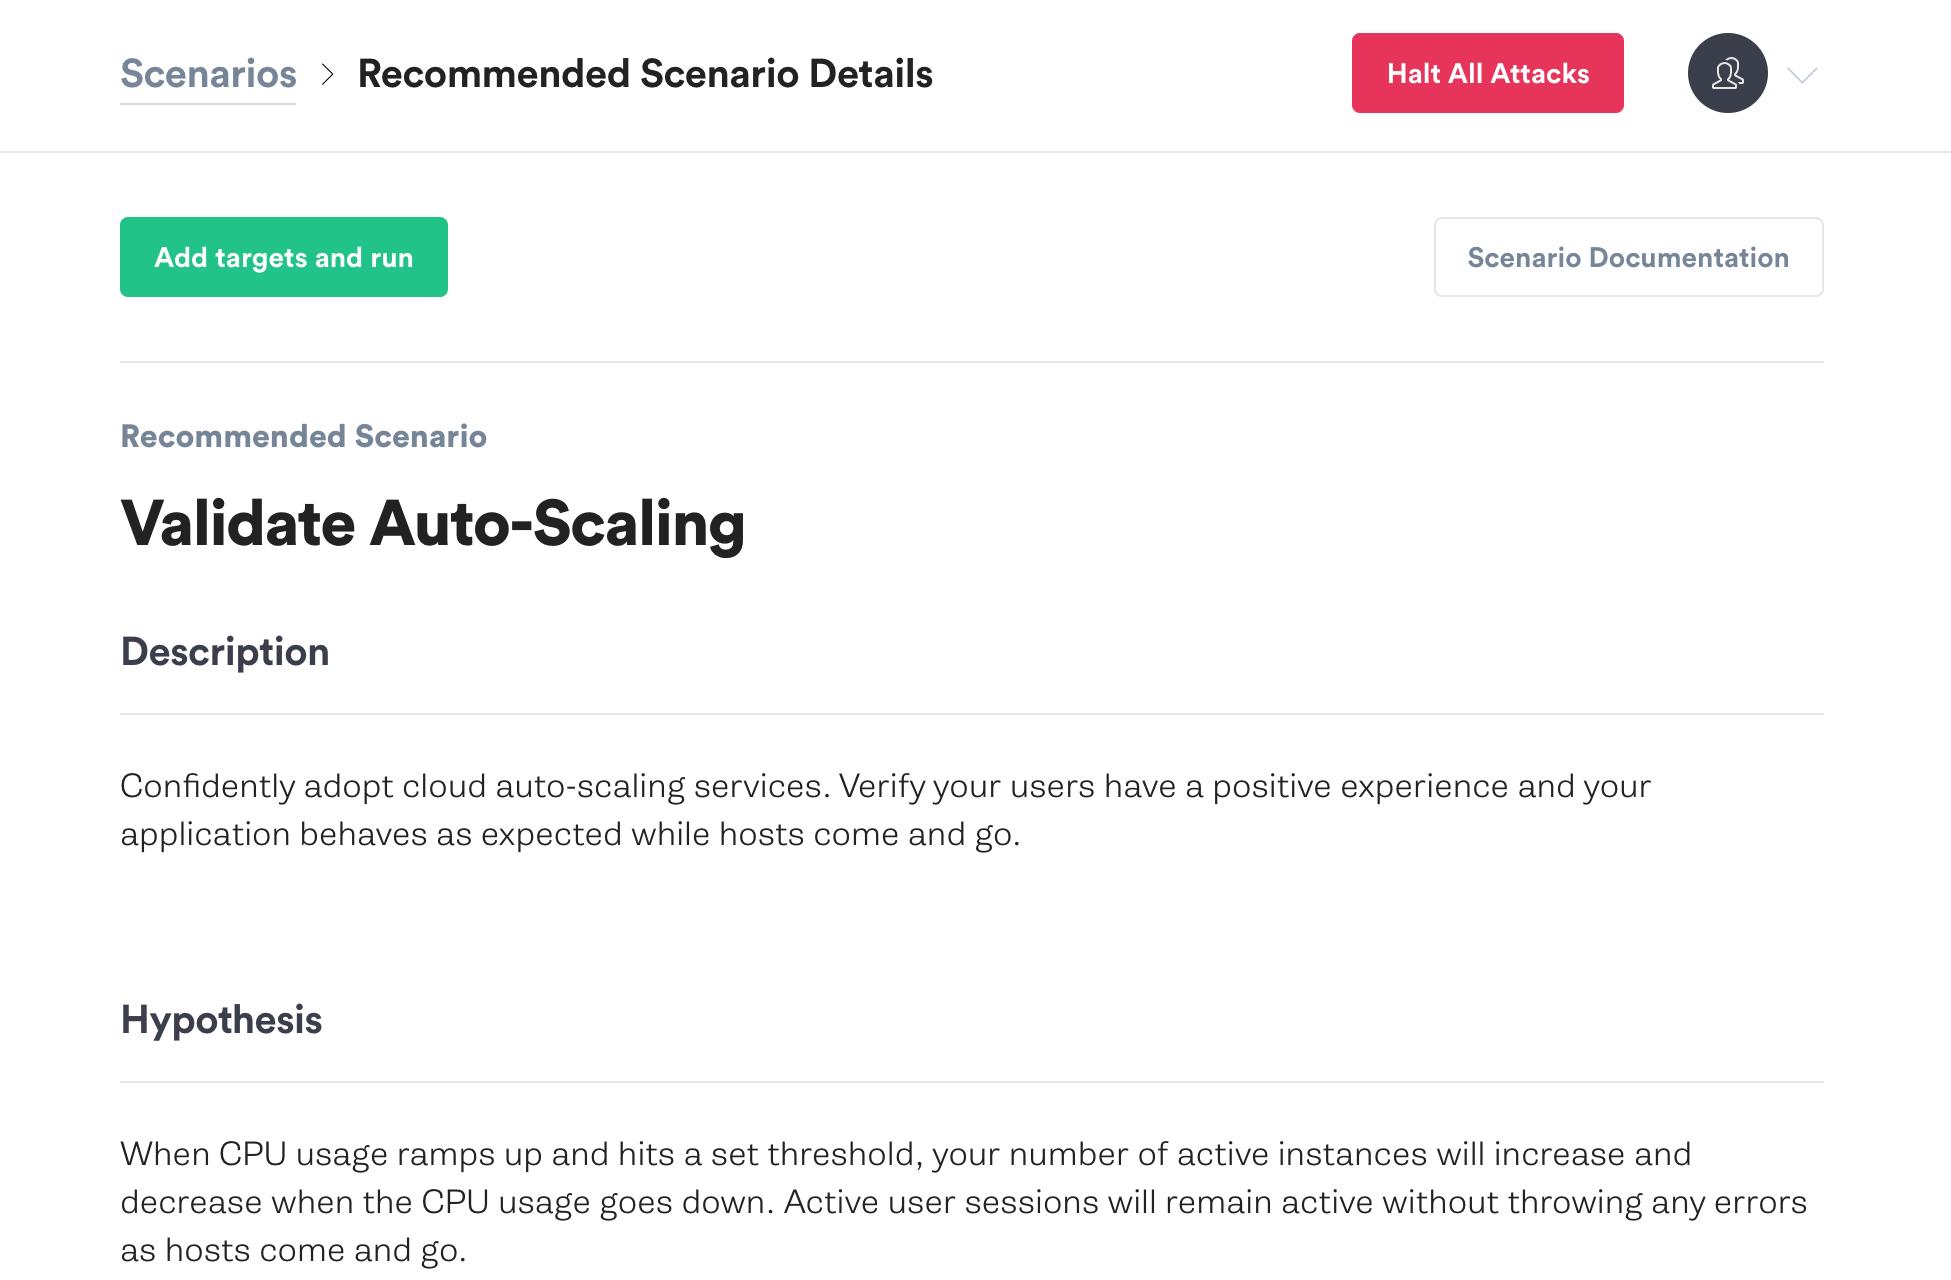 Validate Auto Scaling